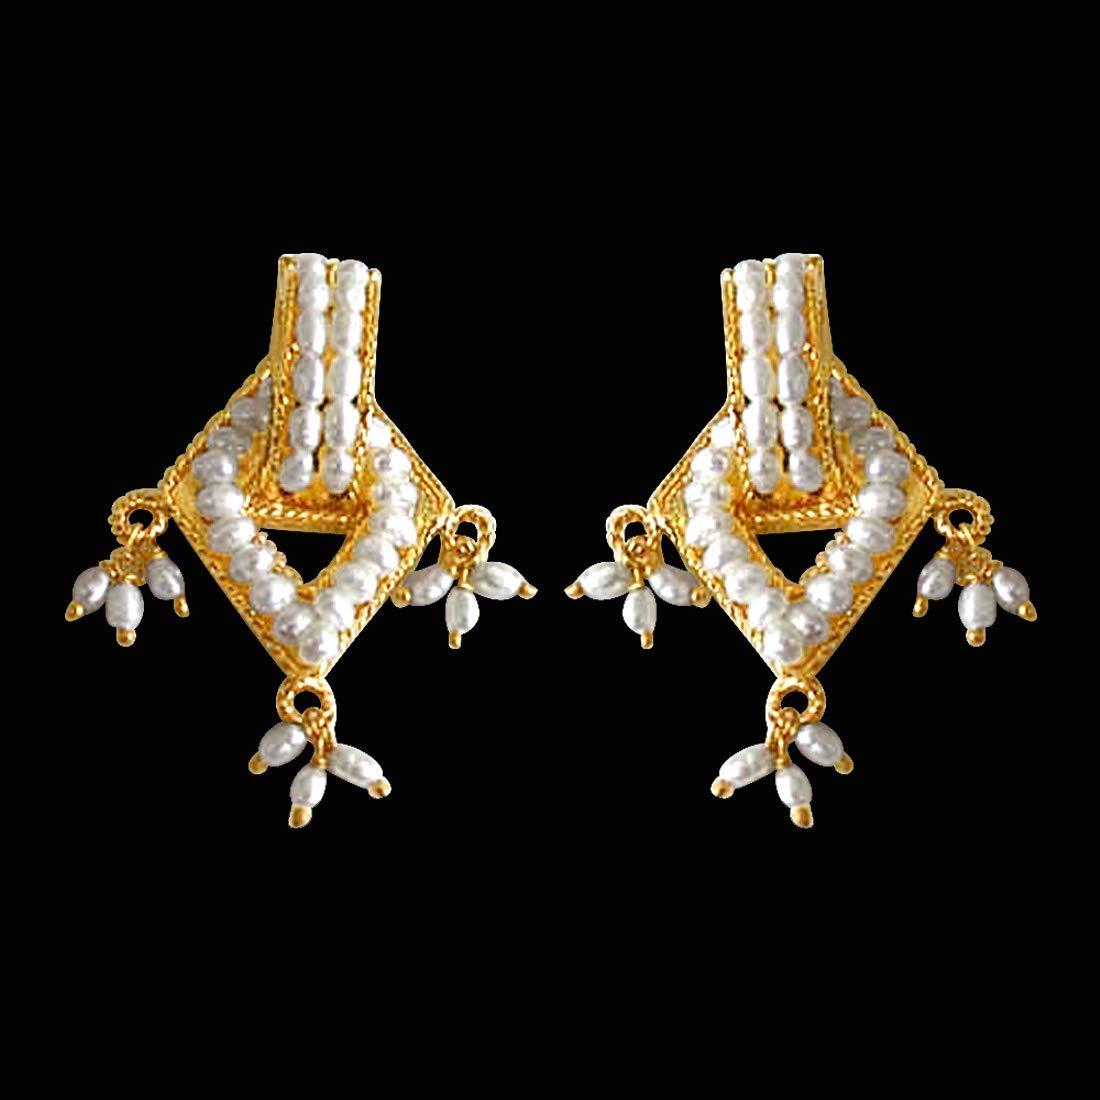 Elegant Earthy Pearl - Real Freshwater Pearl Geometrical Shaped Earring for Women (SE60)